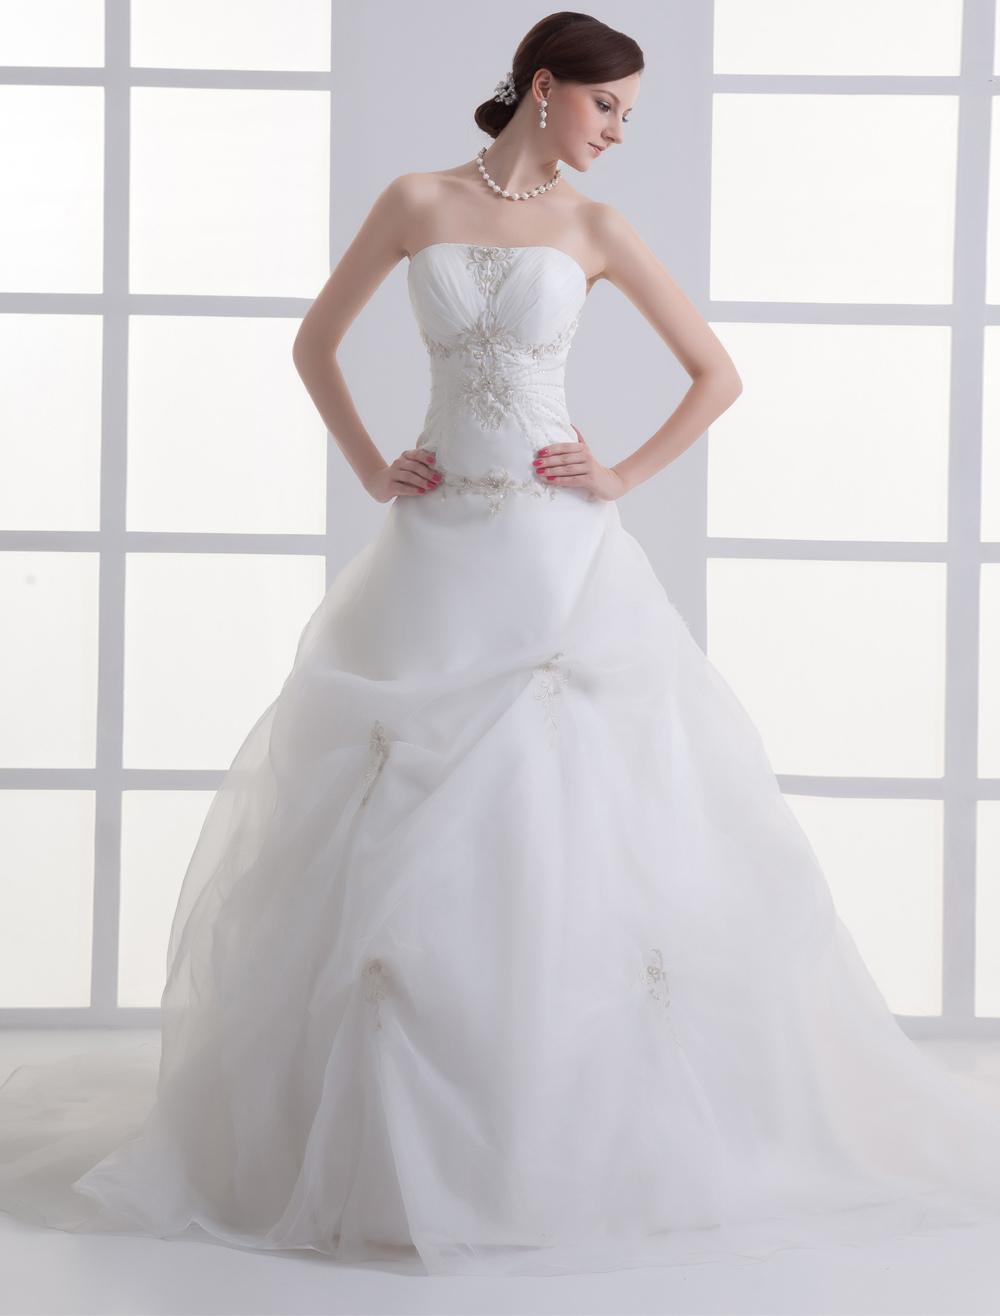 Milanoo / Ivory Strapless Beading Tulle Bridal Wedding Dress